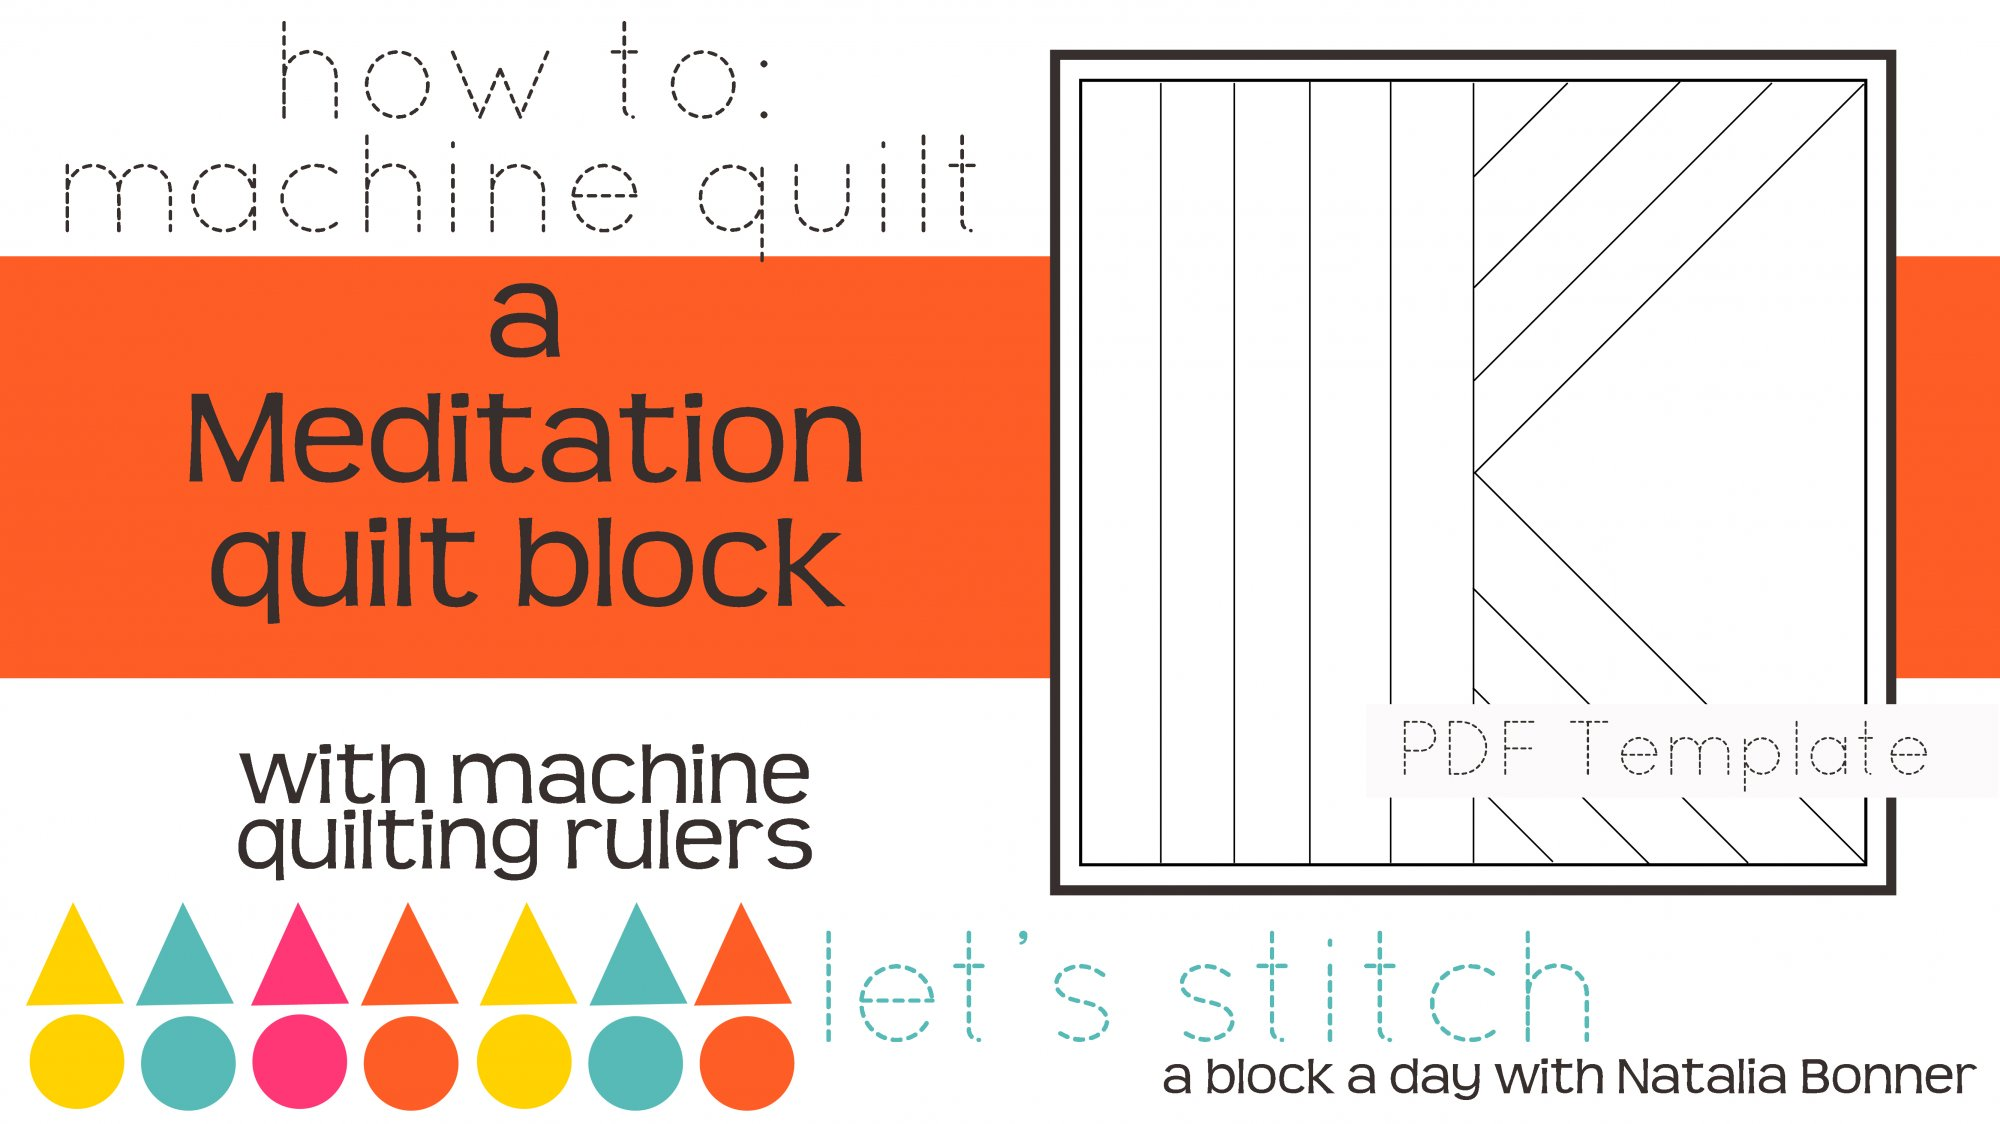 Let's Stitch - A Block a Day With Natalia Bonner - PDF - Meditation